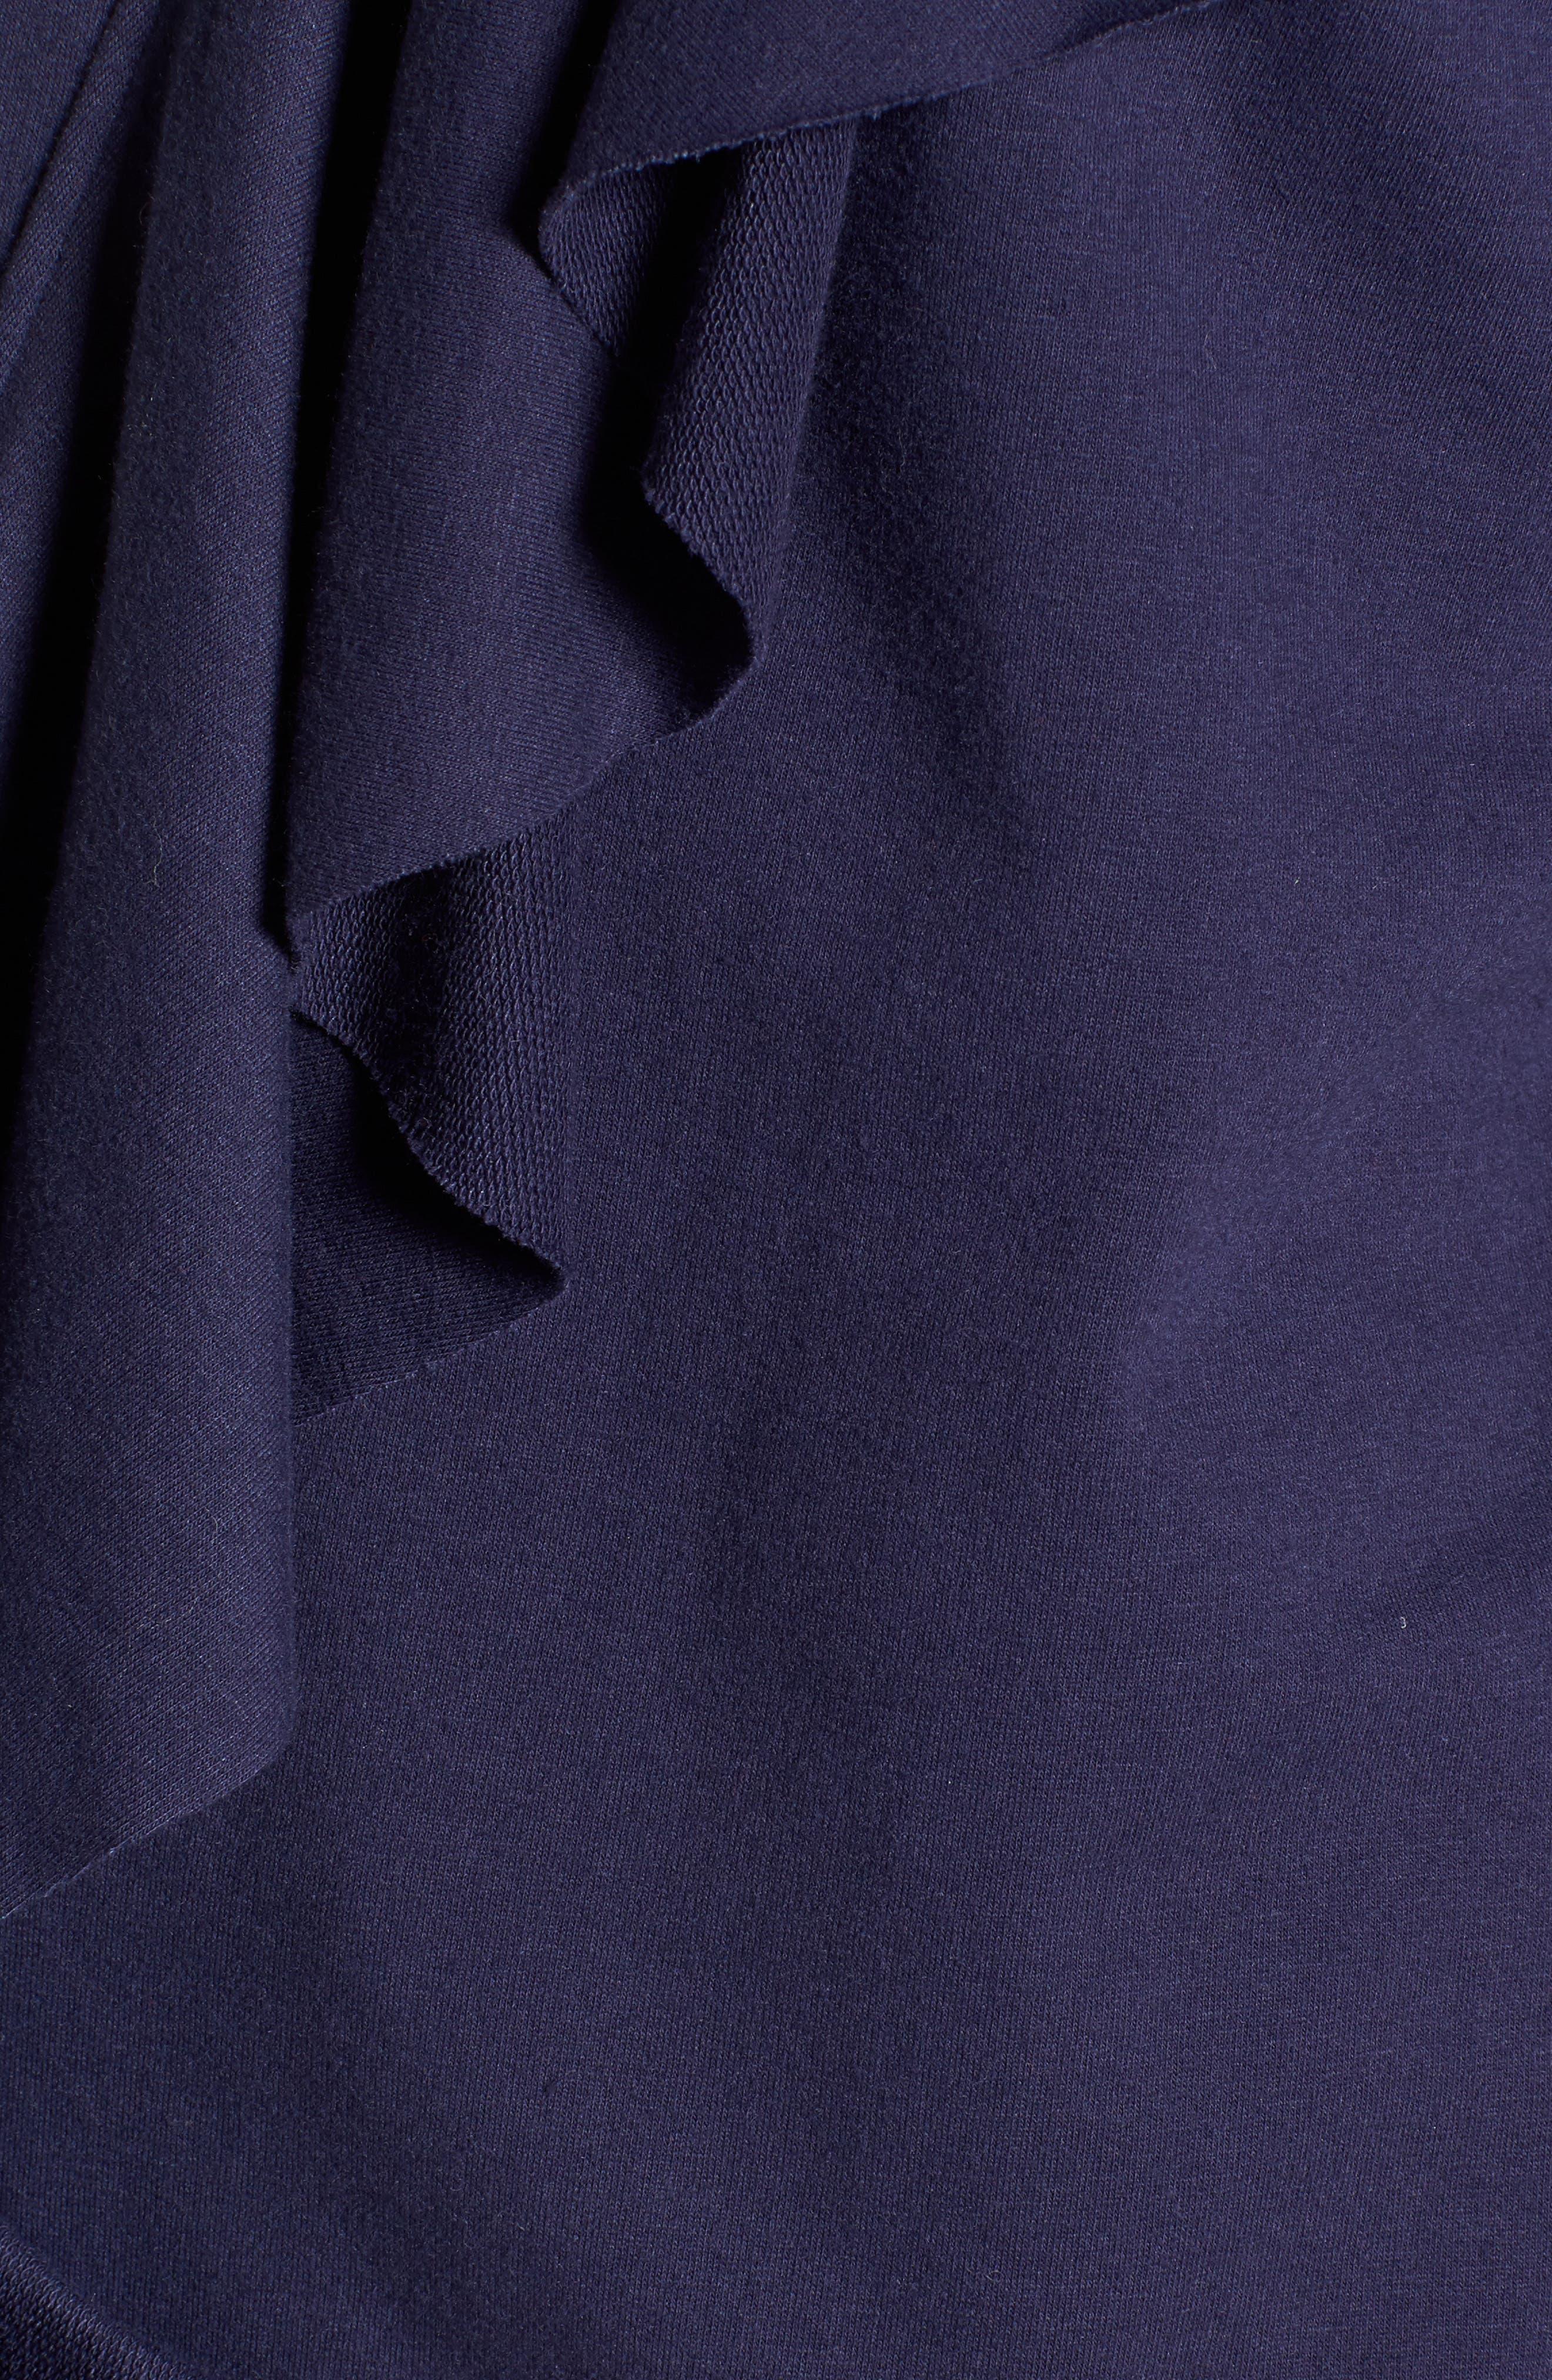 Asymmetrical Ruffle Sweatshirt,                             Alternate thumbnail 5, color,                             400